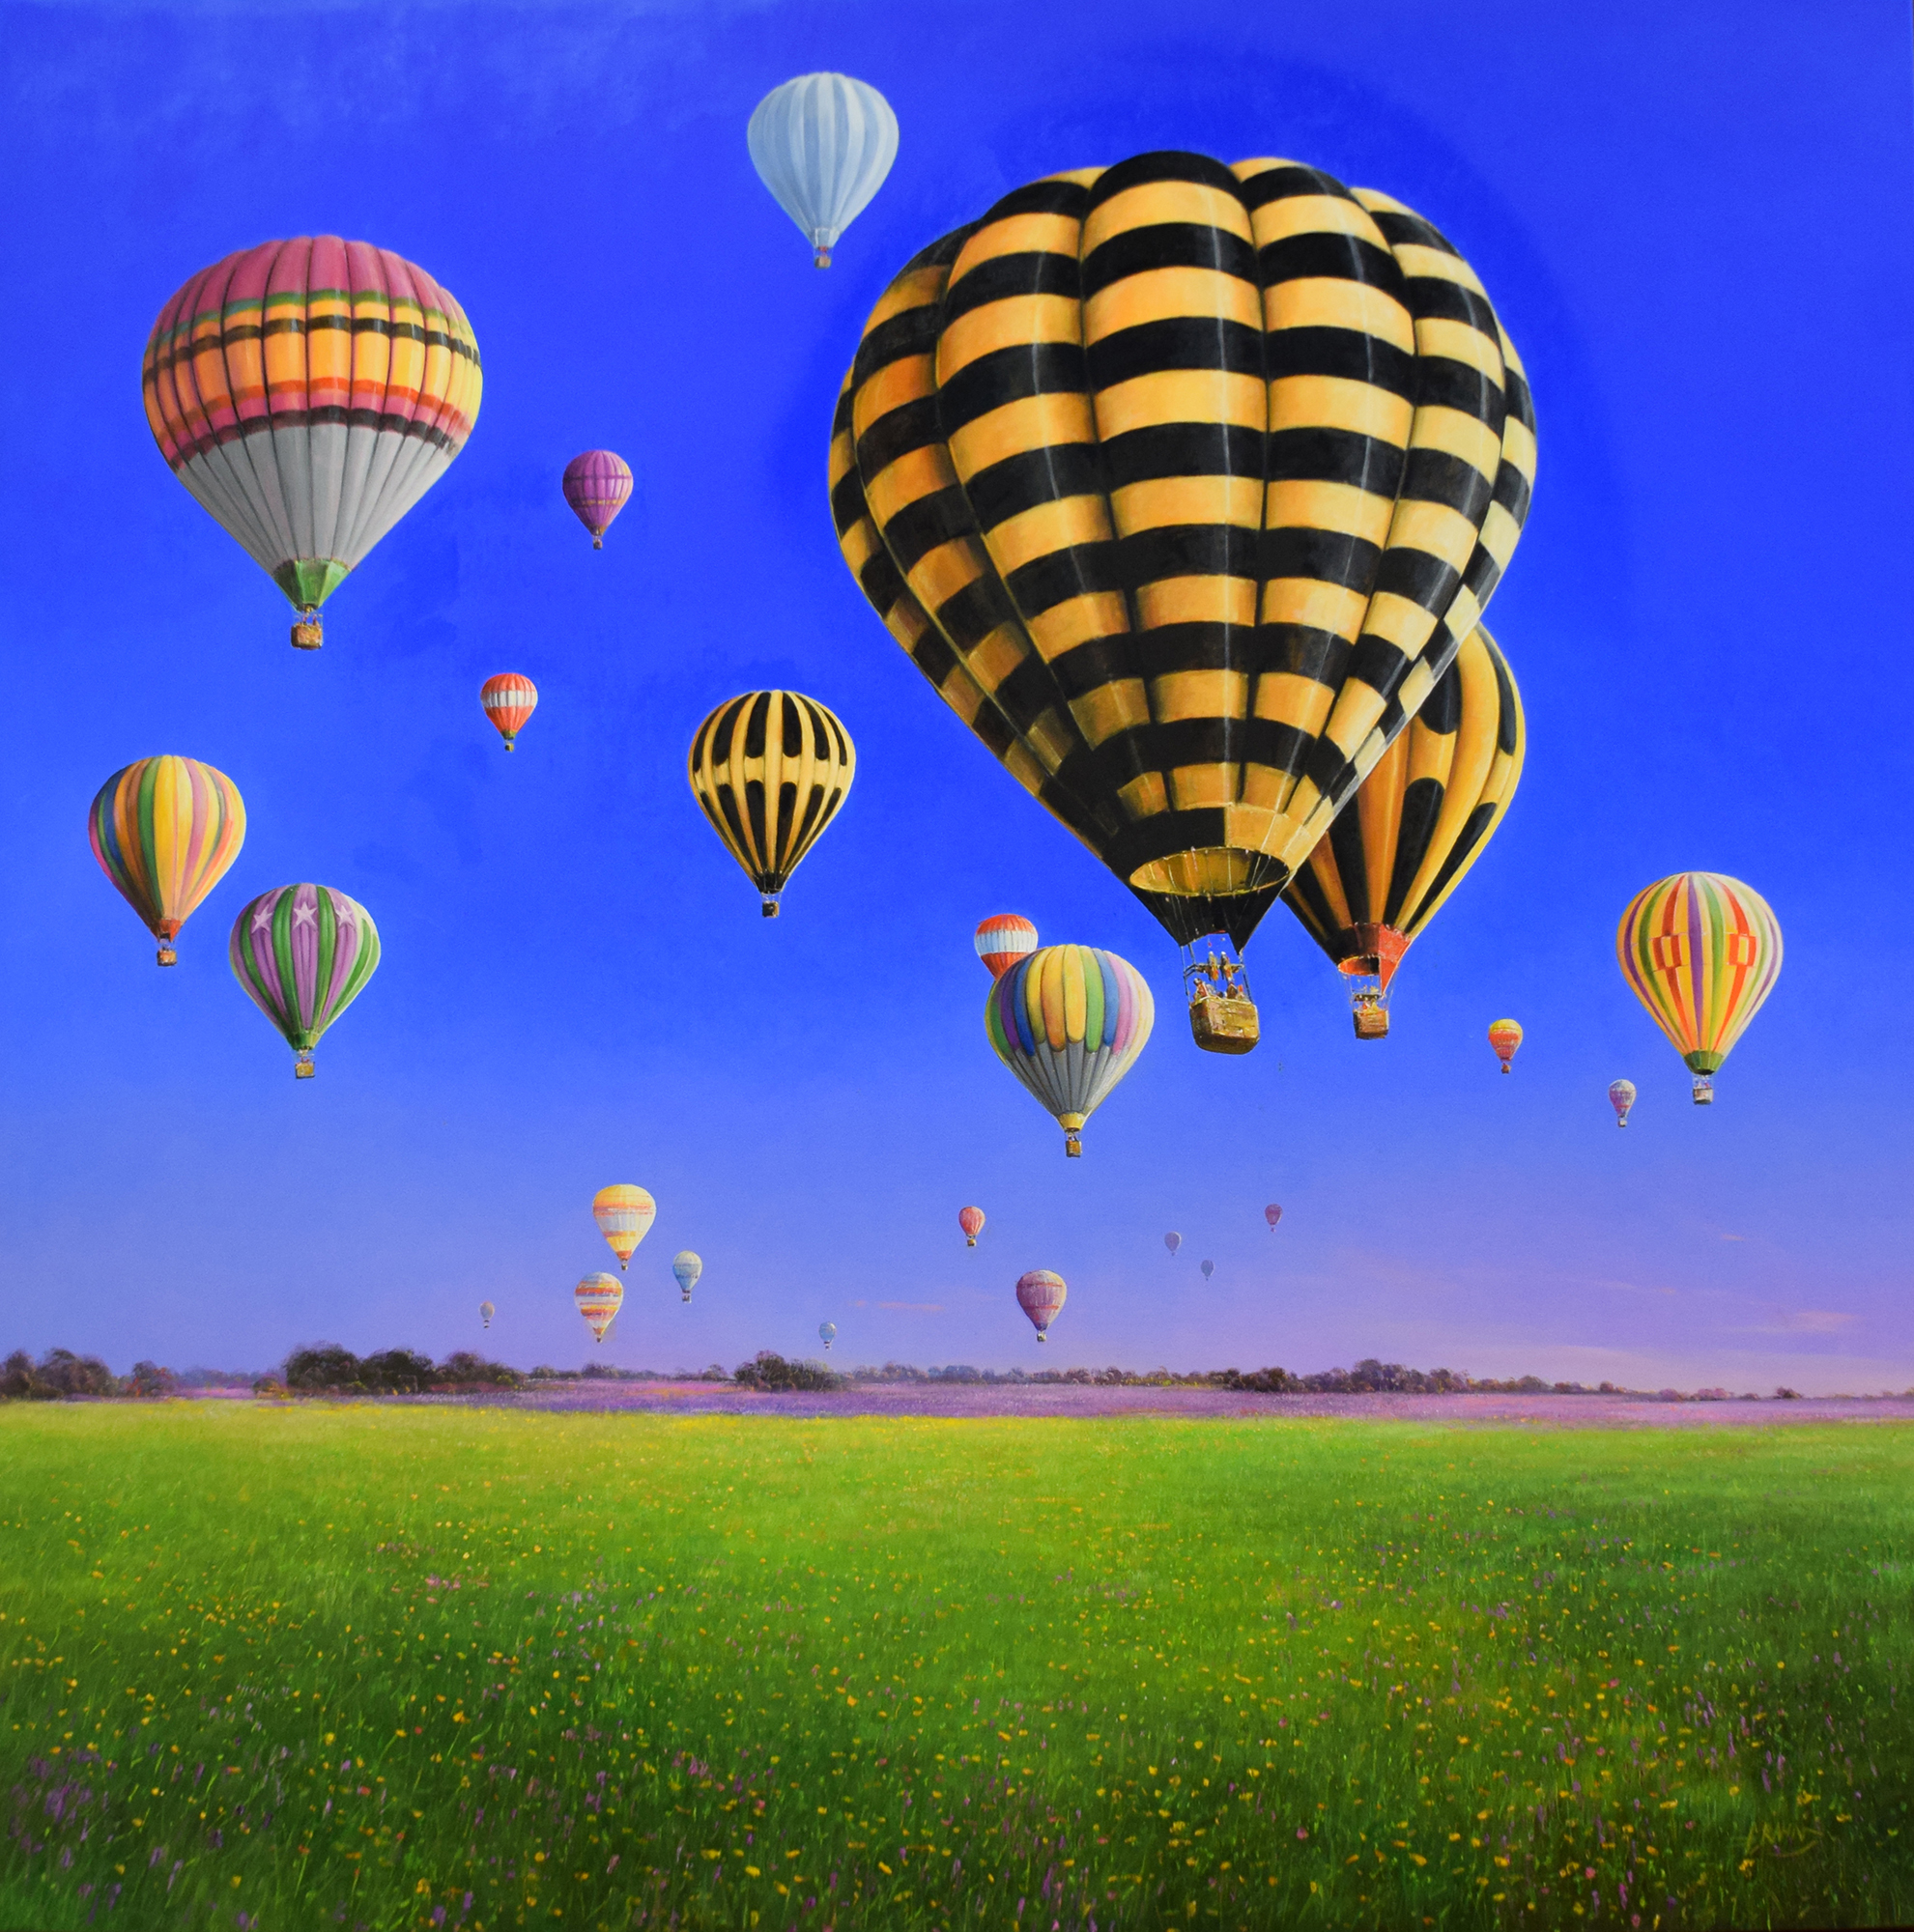 Detlef Rahn - Heißluftballons , 7840-006-930